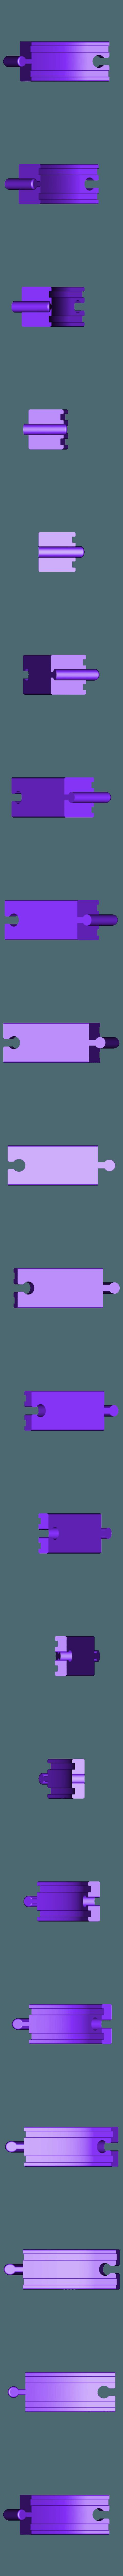 Upslope Start Track.stl Download free STL file Toy Train Tracks • 3D printer design, FerryTeacher